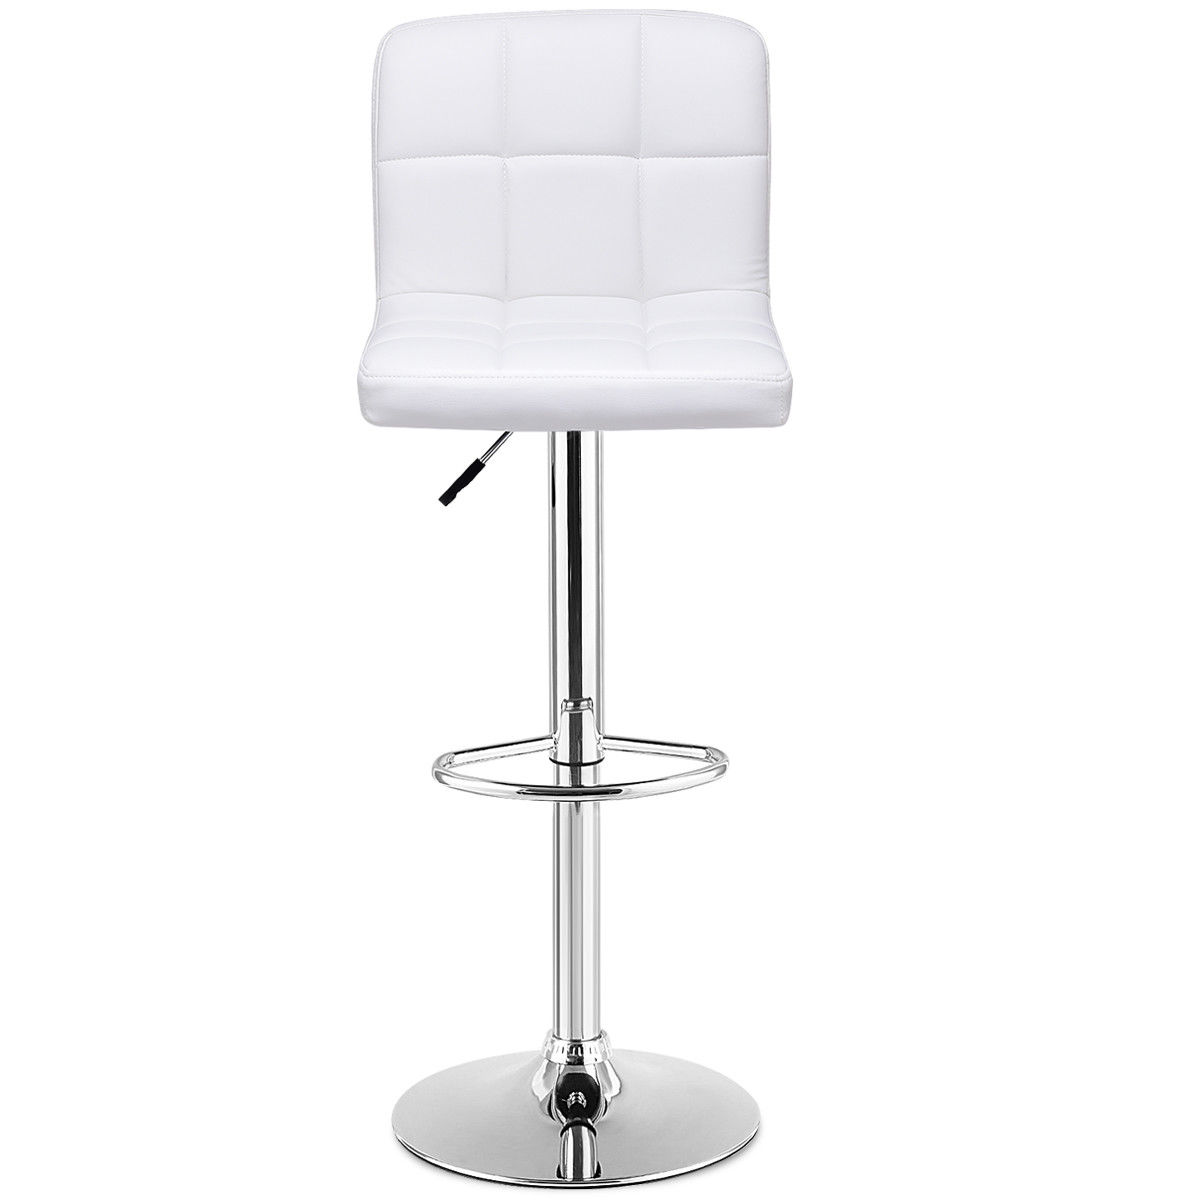 Set Of 2 Bar Stools PU Leather Adjustable Barstool Swivel Pub Chairs White - image 6 de 10